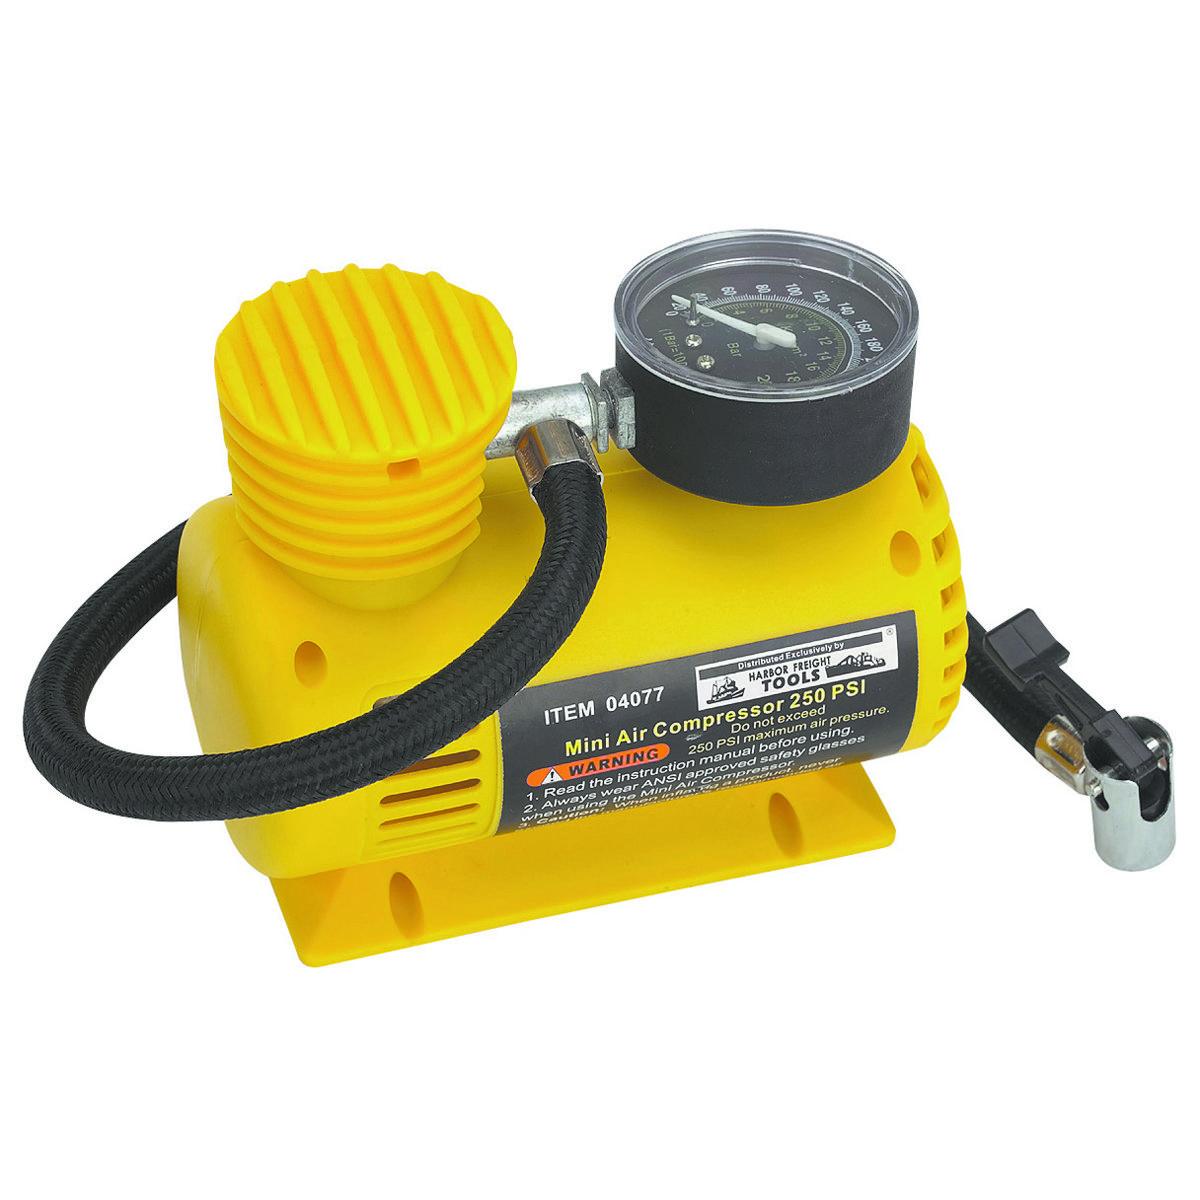 hight resolution of 12 volt 250 psi compact air compressor